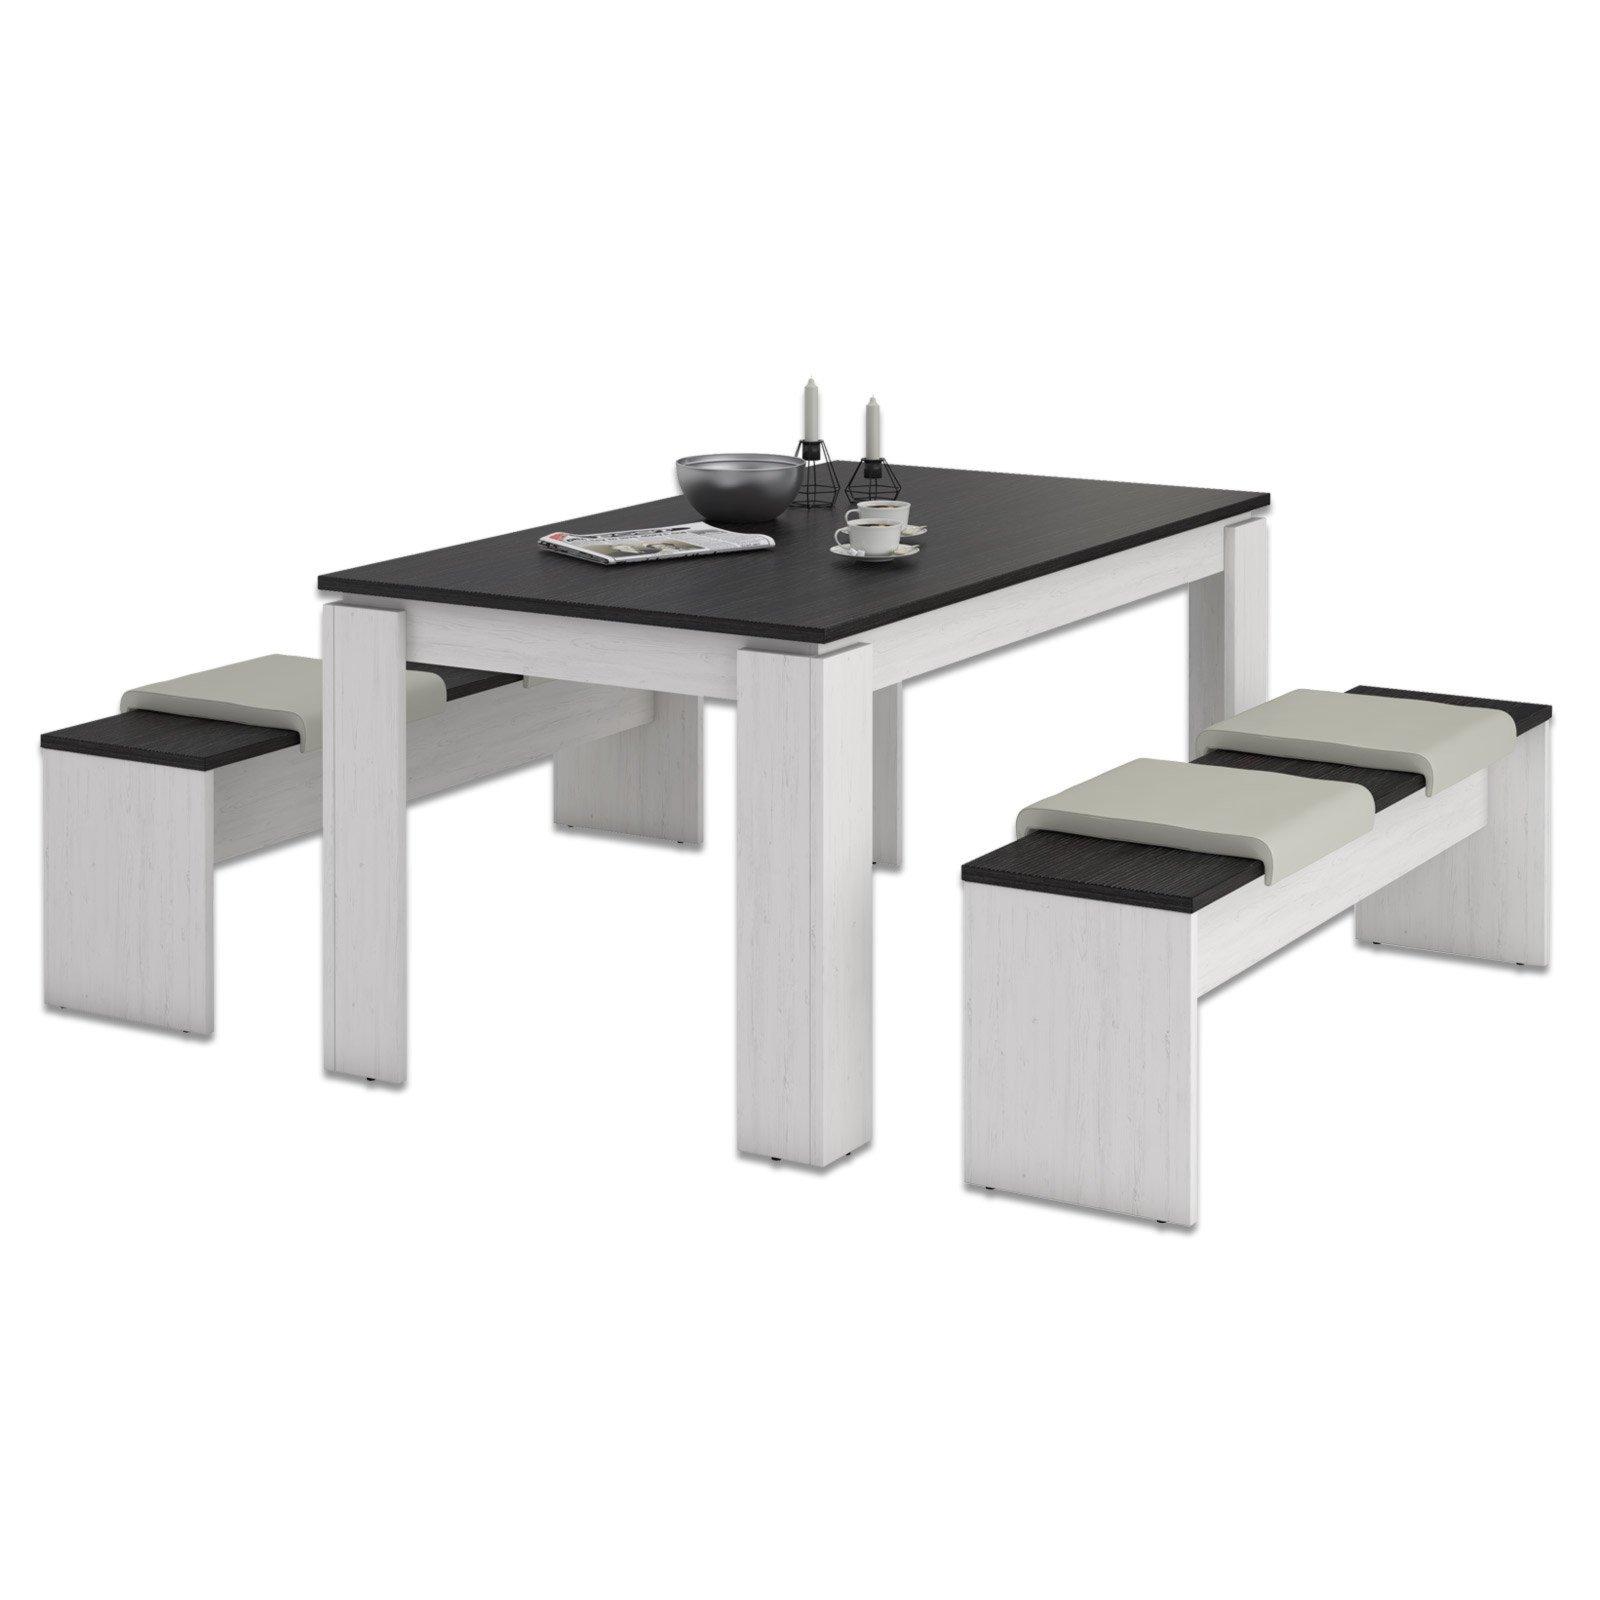 tischgruppe 3 teilig tischgruppe 3 teilig with. Black Bedroom Furniture Sets. Home Design Ideas